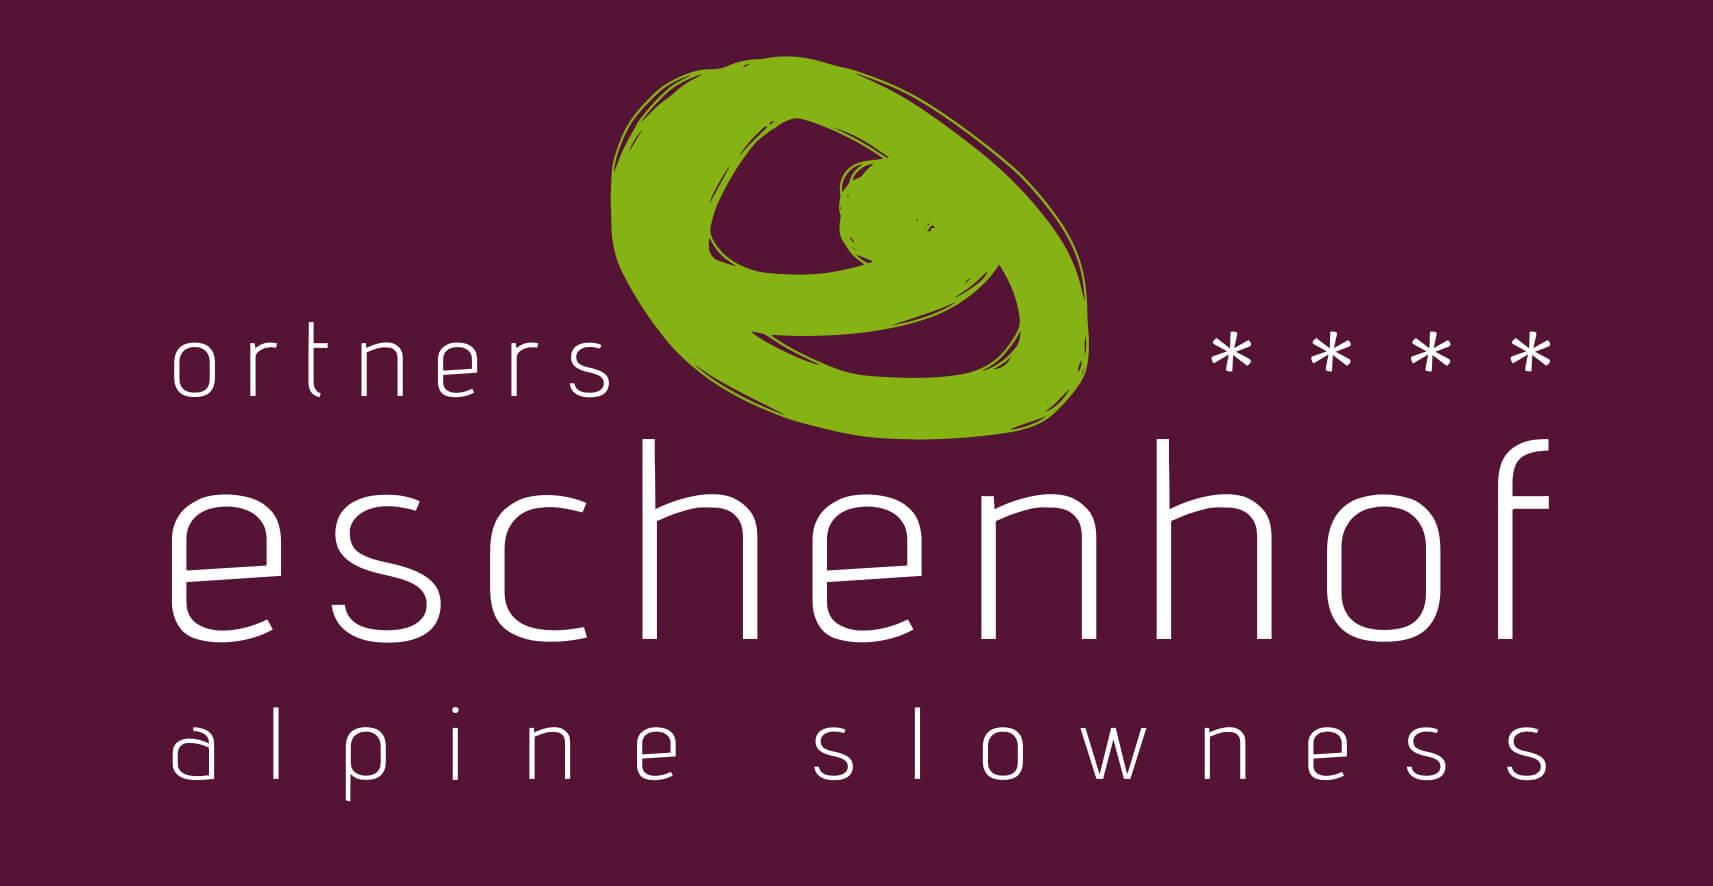 Logo Ortners Eschenhof - alpine slowness